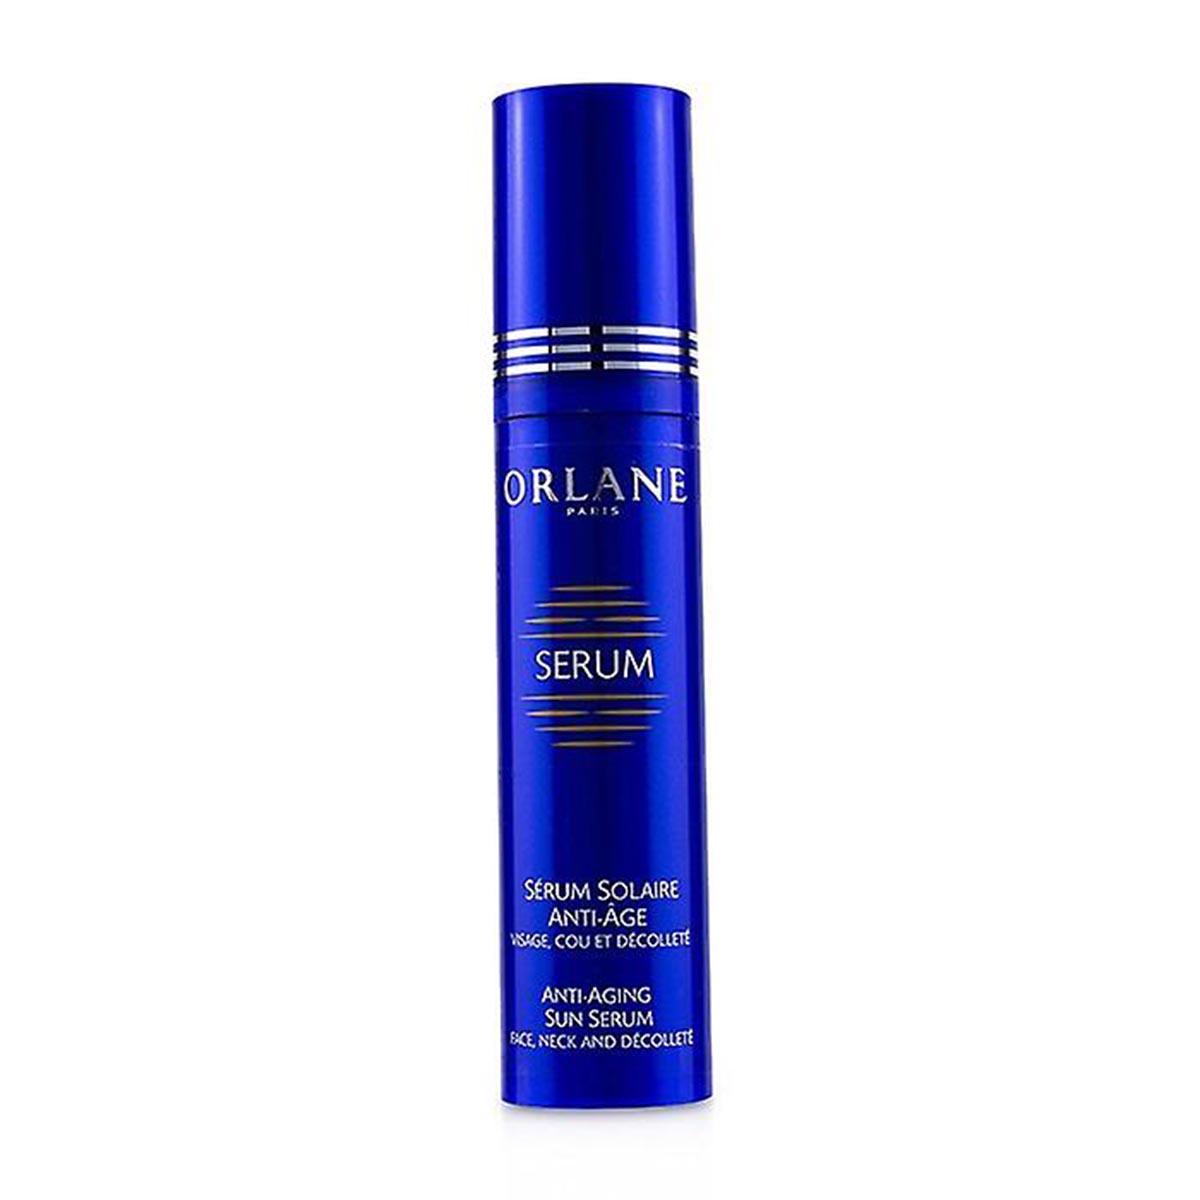 Orlane serum solaire anti age sun serum face neck and decollete 50ml